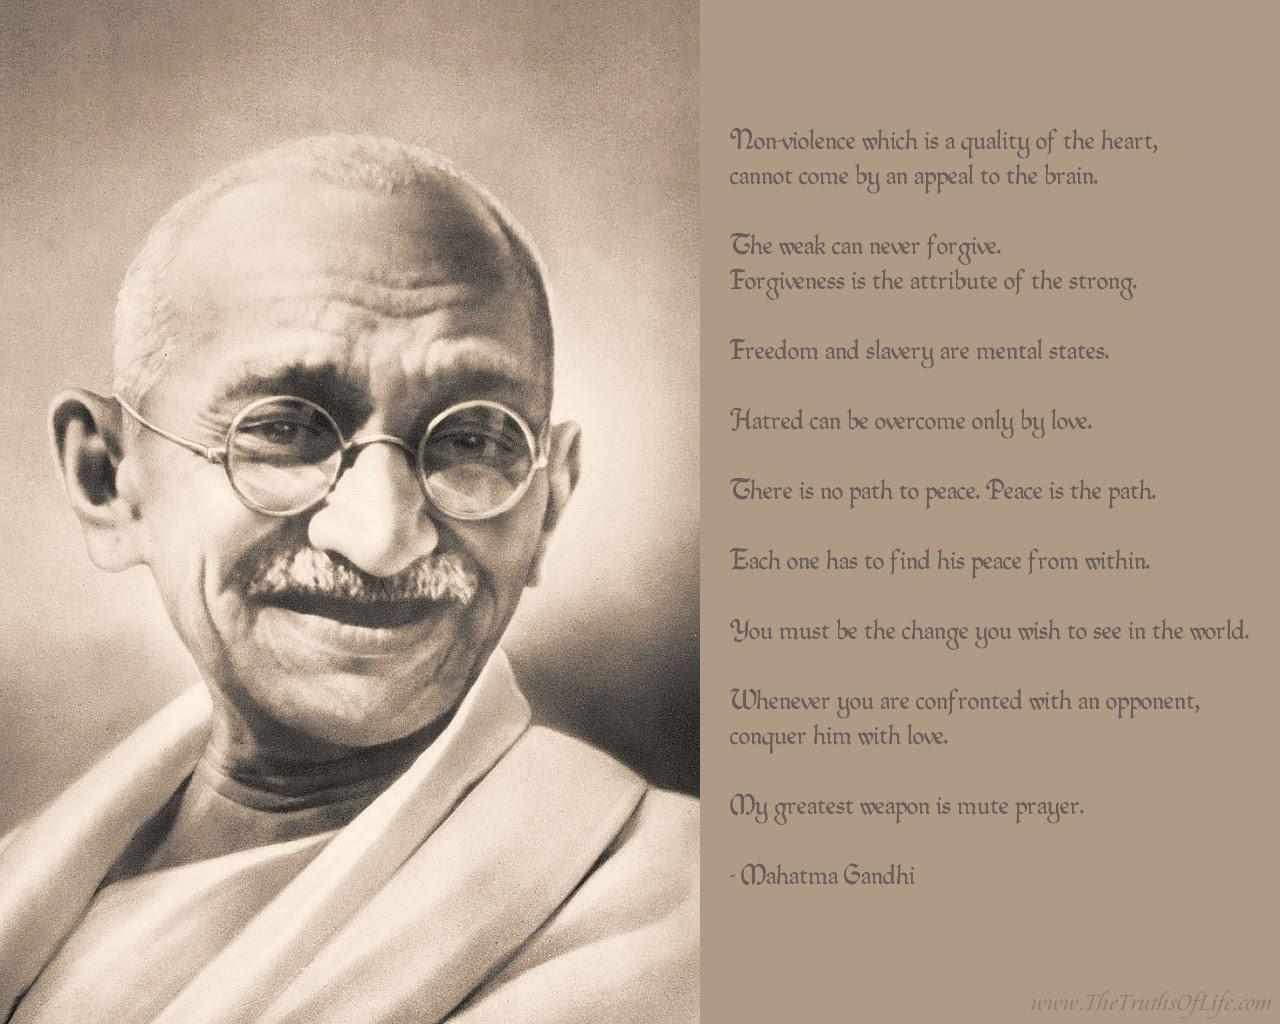 http://www.thetruthsoflife.com/spiritual-wallpapers/peace/ghandi-1280x1024.jpg